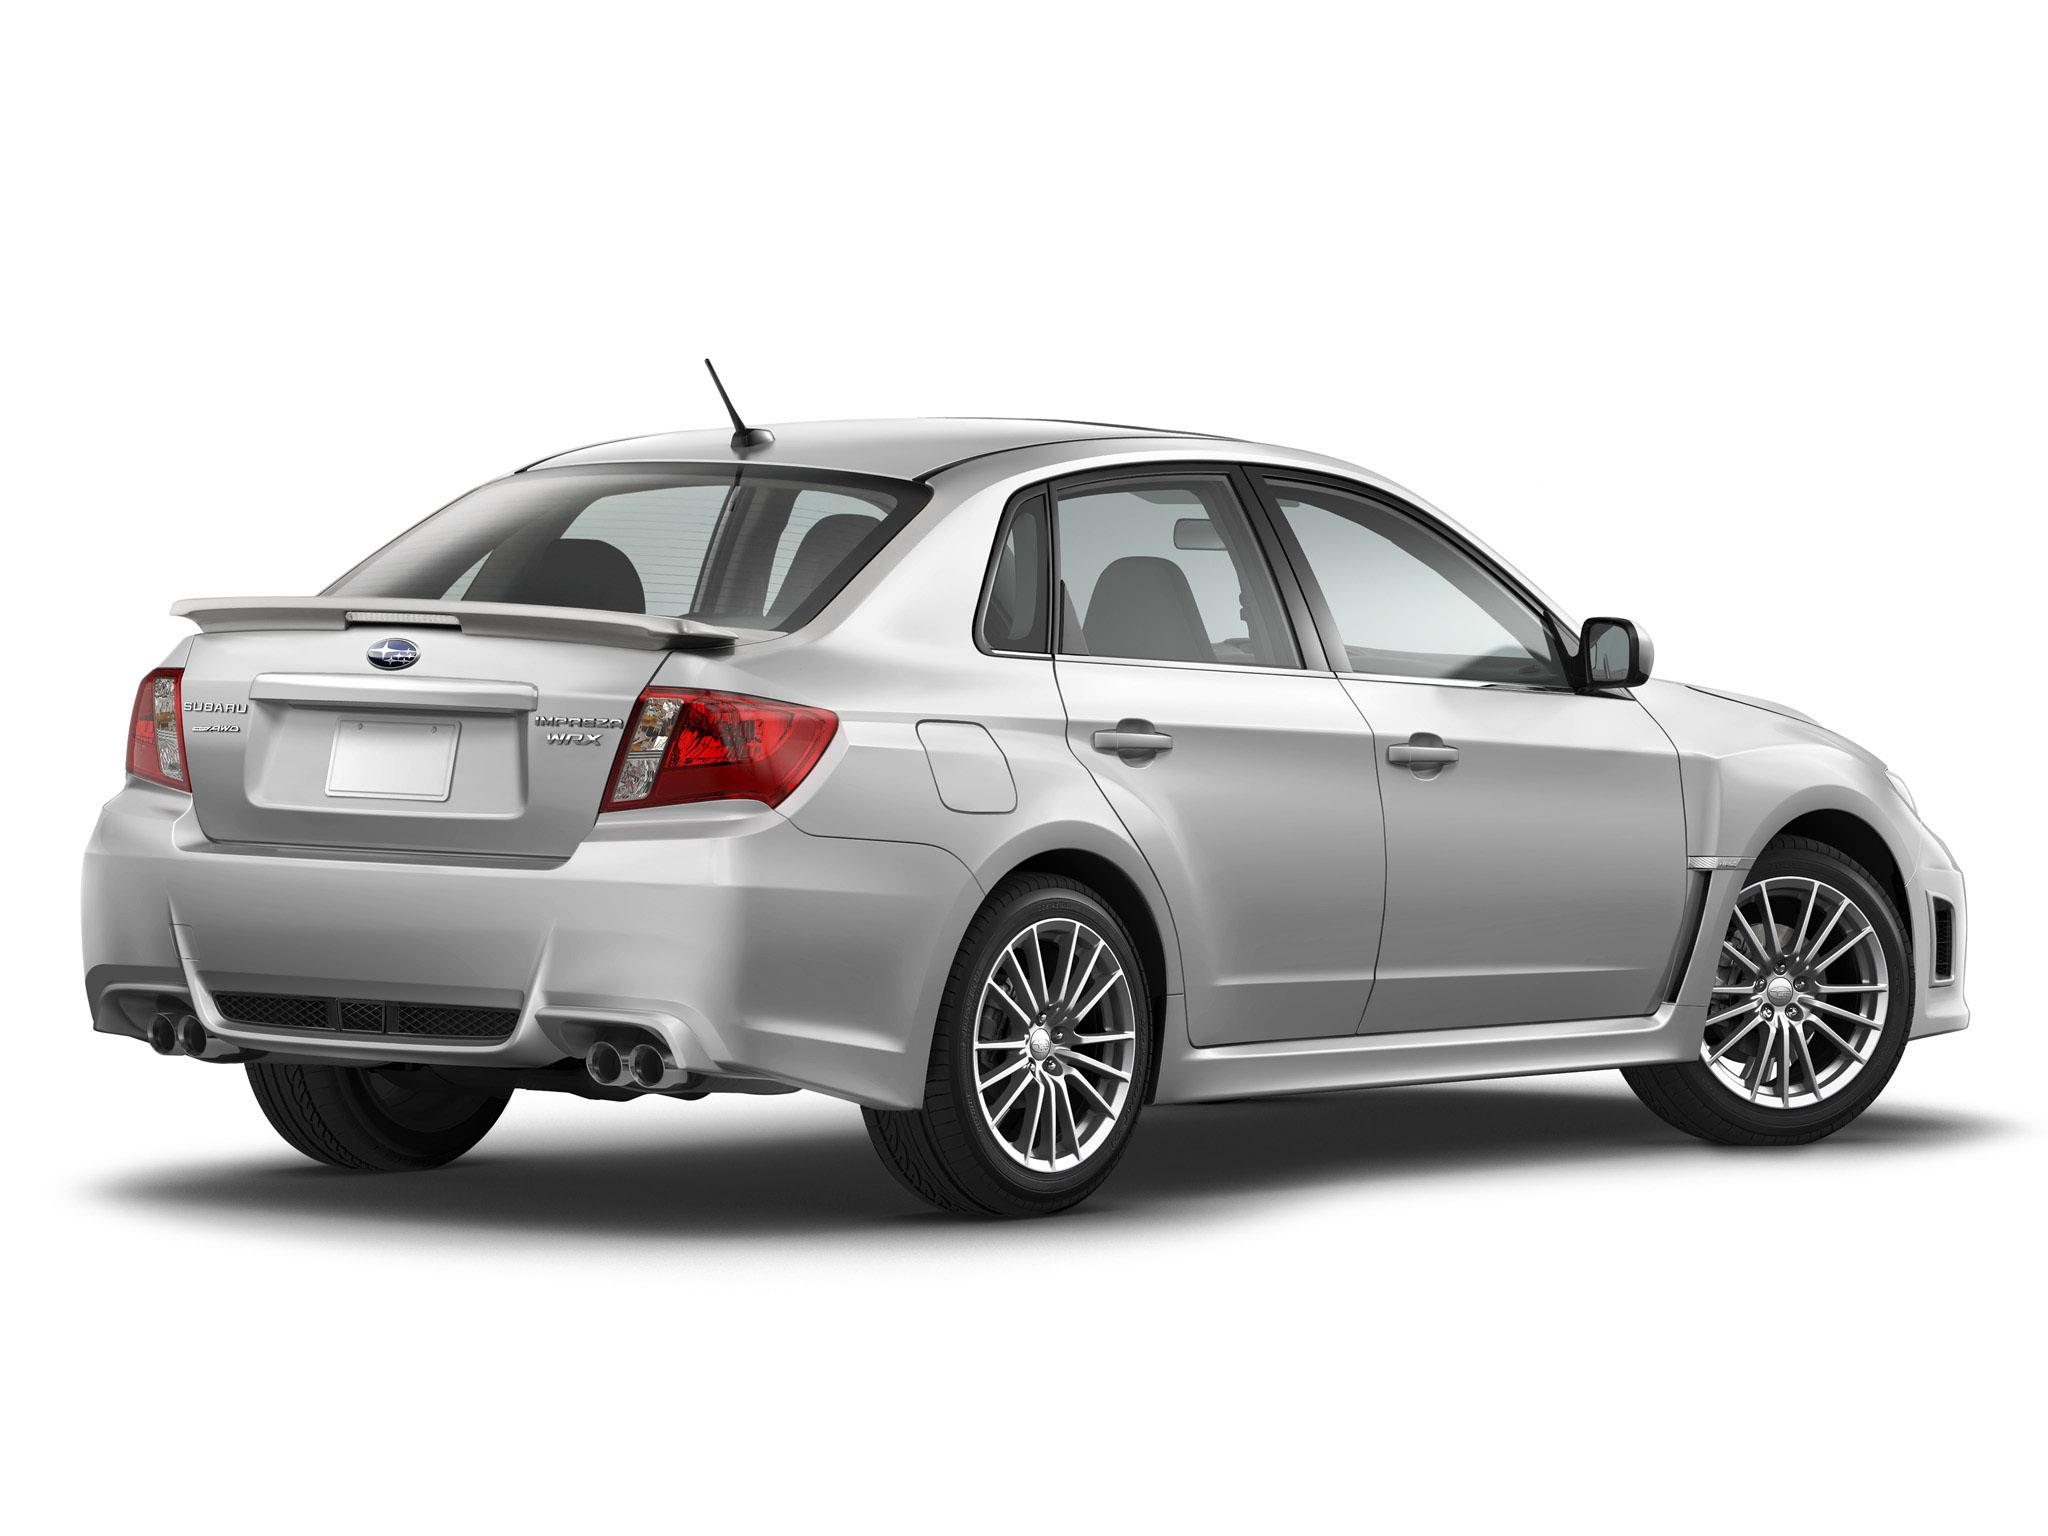 Subaru impreza wrx sedan usa 2010 subaru impreza wrx sedan usa download full size 2048 1536 pixels vanachro Image collections